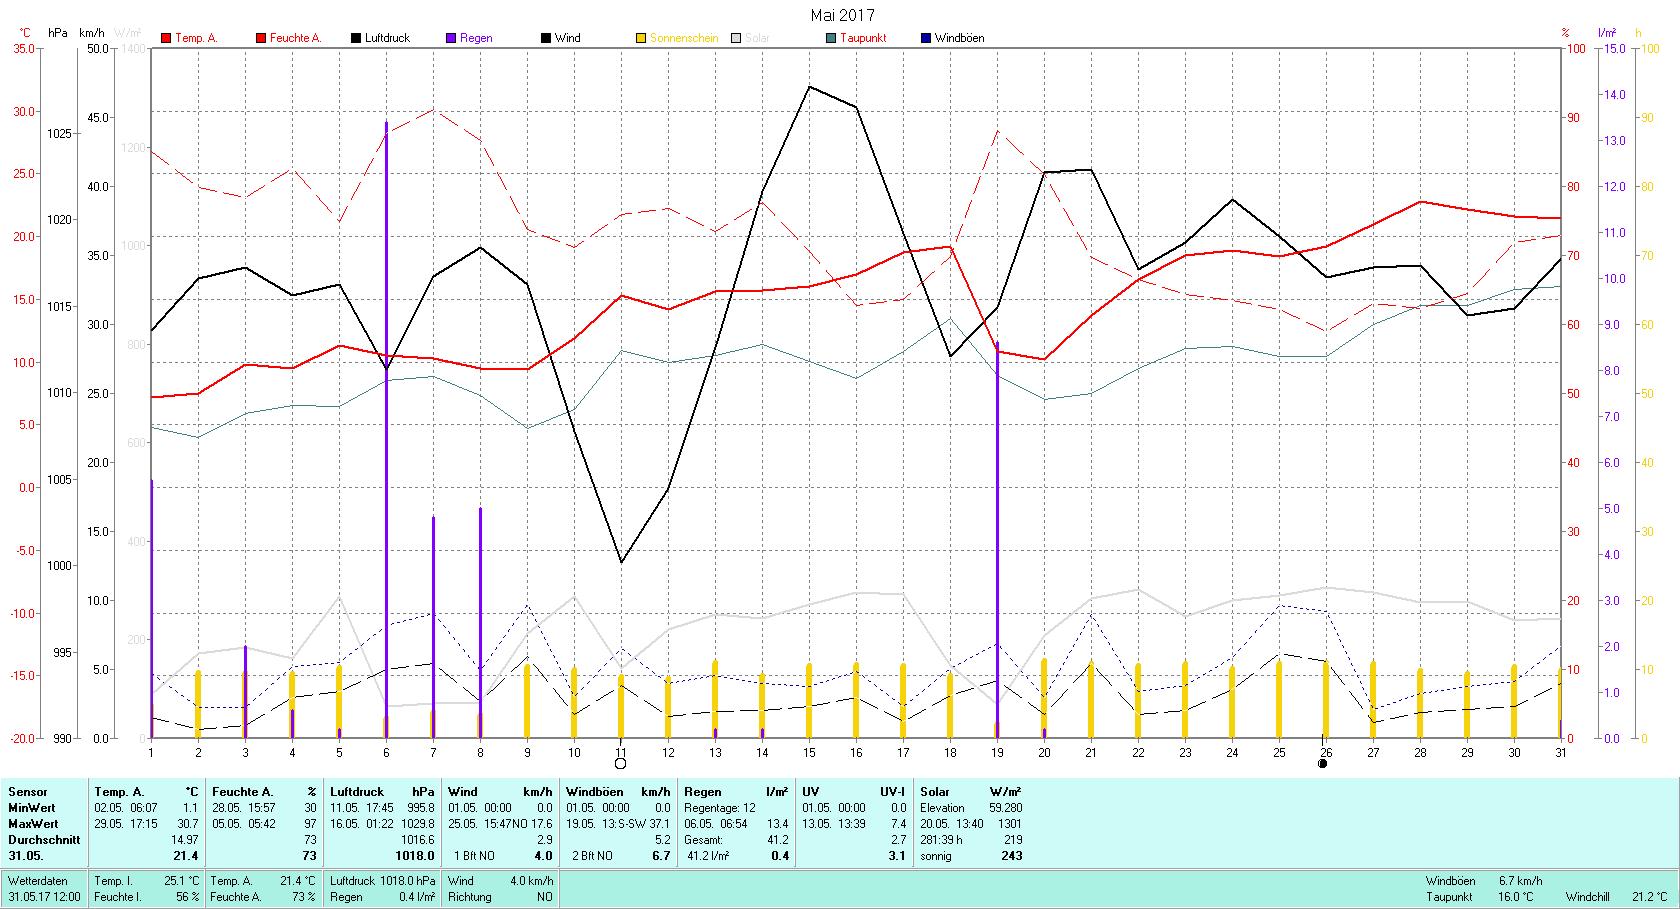 Mai 2017 Tmin 1.1°C, Tmax 30.7°C, Sonne 281:39h, Niederschlag 41.2mm/2